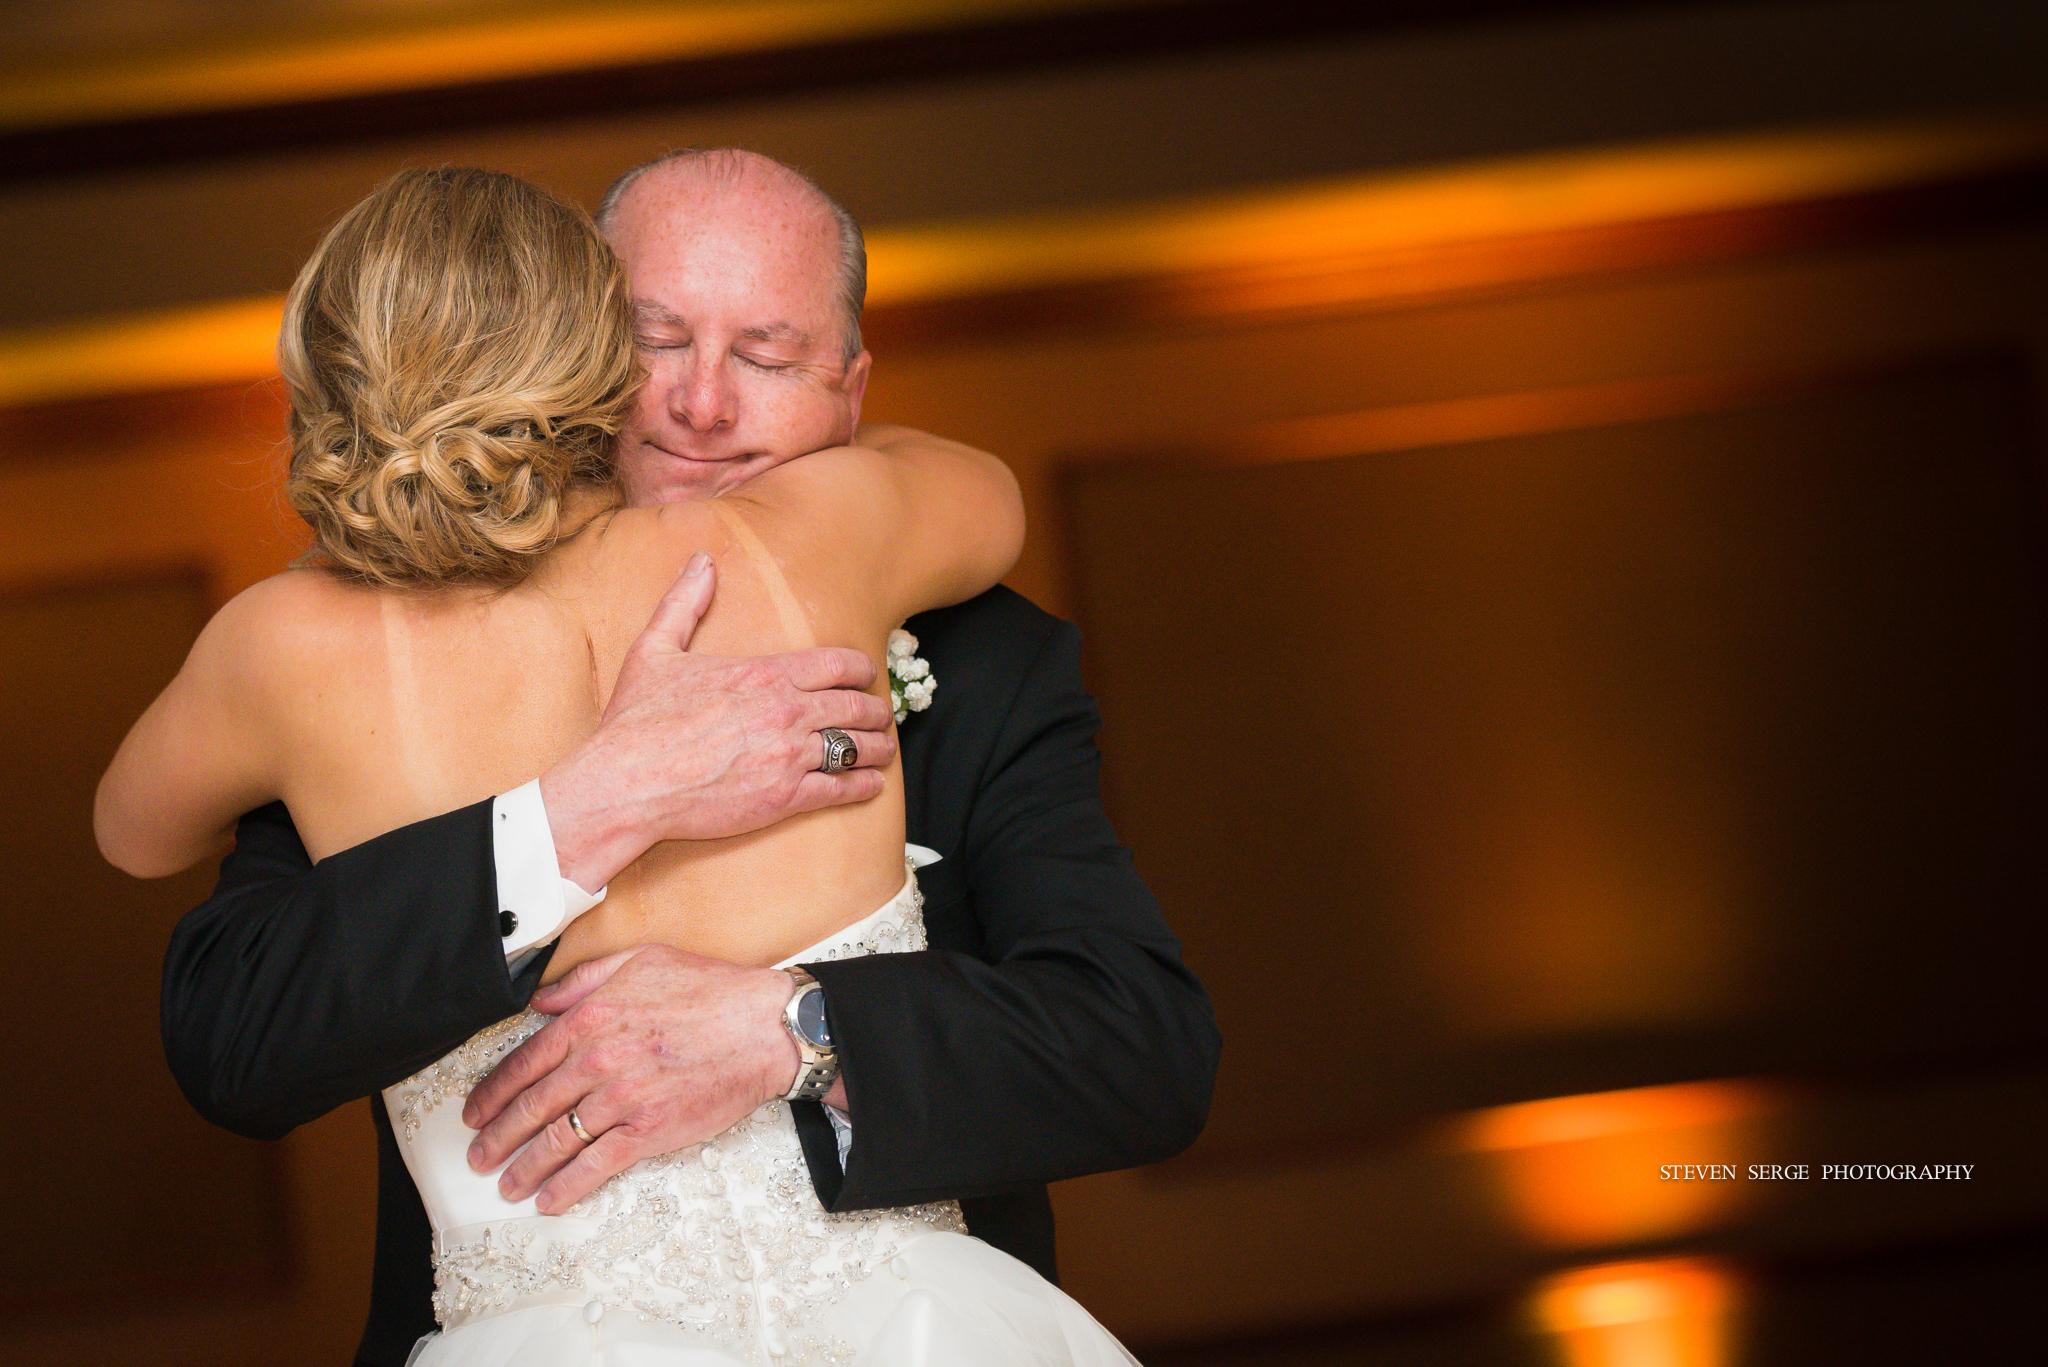 scranton-wedding-photographers-hilton-steven-serge-photography-17.jpg